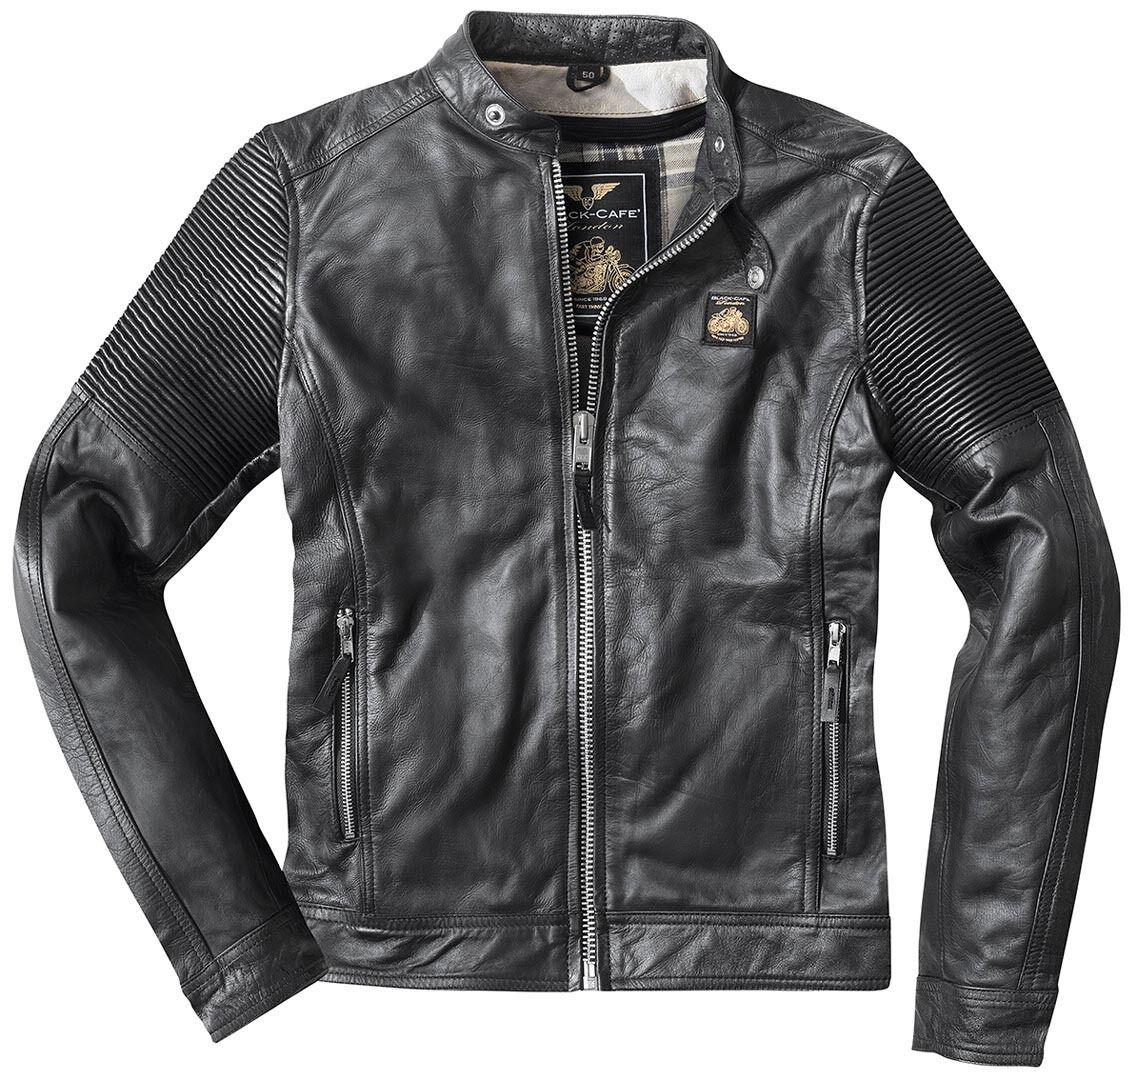 Black-Cafe London Milano Veste en cuir de moto Noir taille : 52